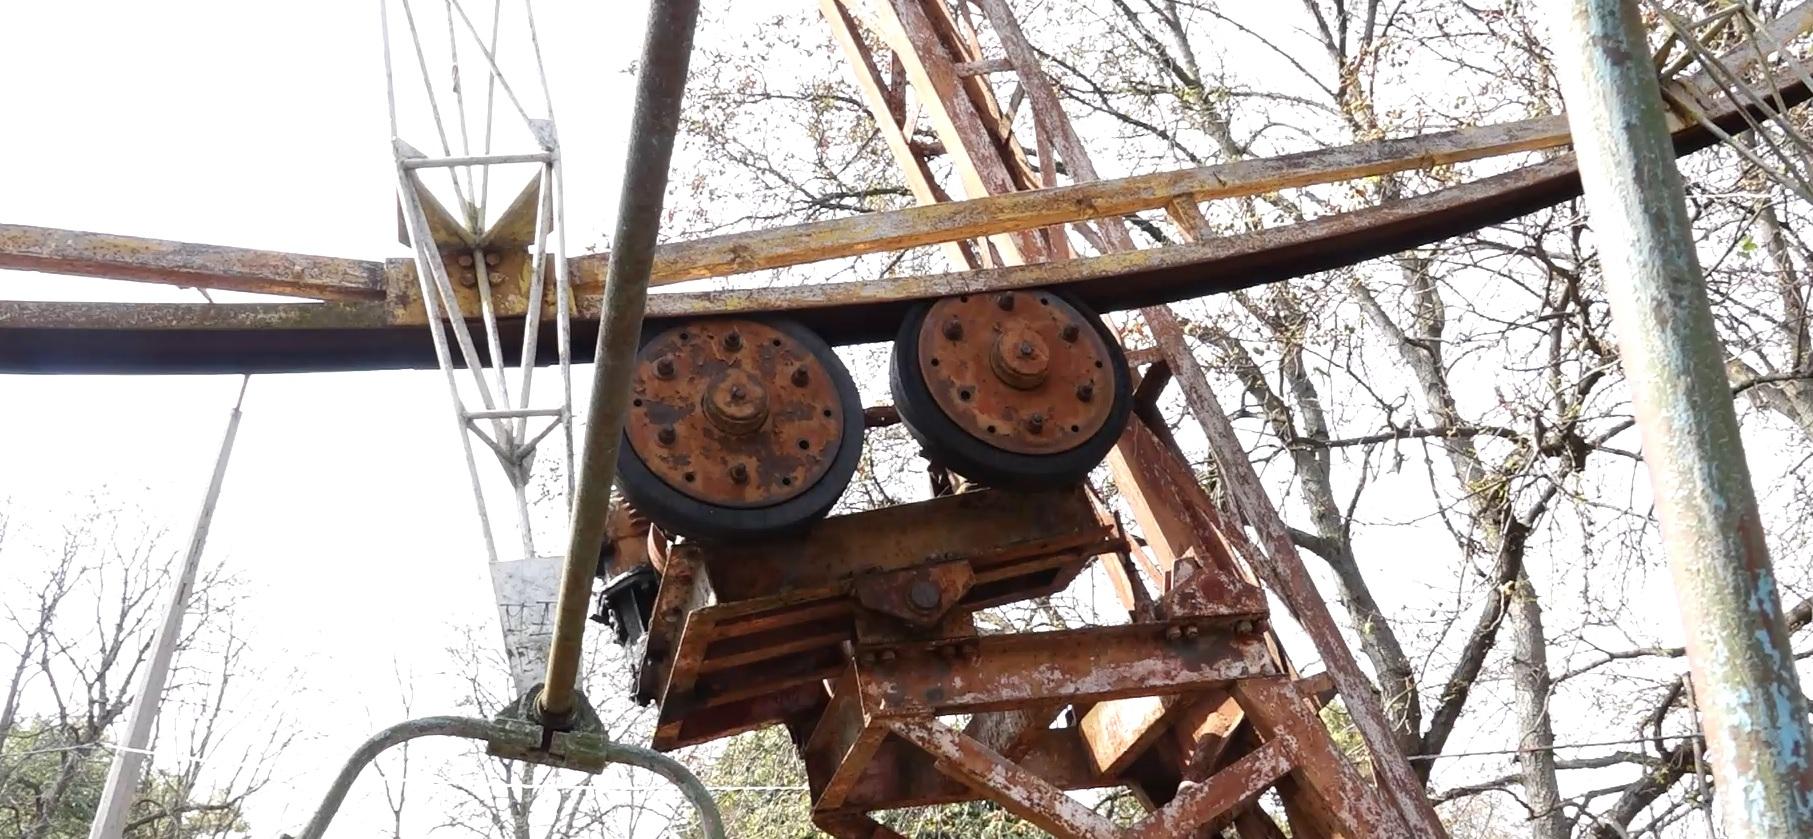 Непрацюючі та іржаві: хто занедбав атракціони у центральному парку Кременеця